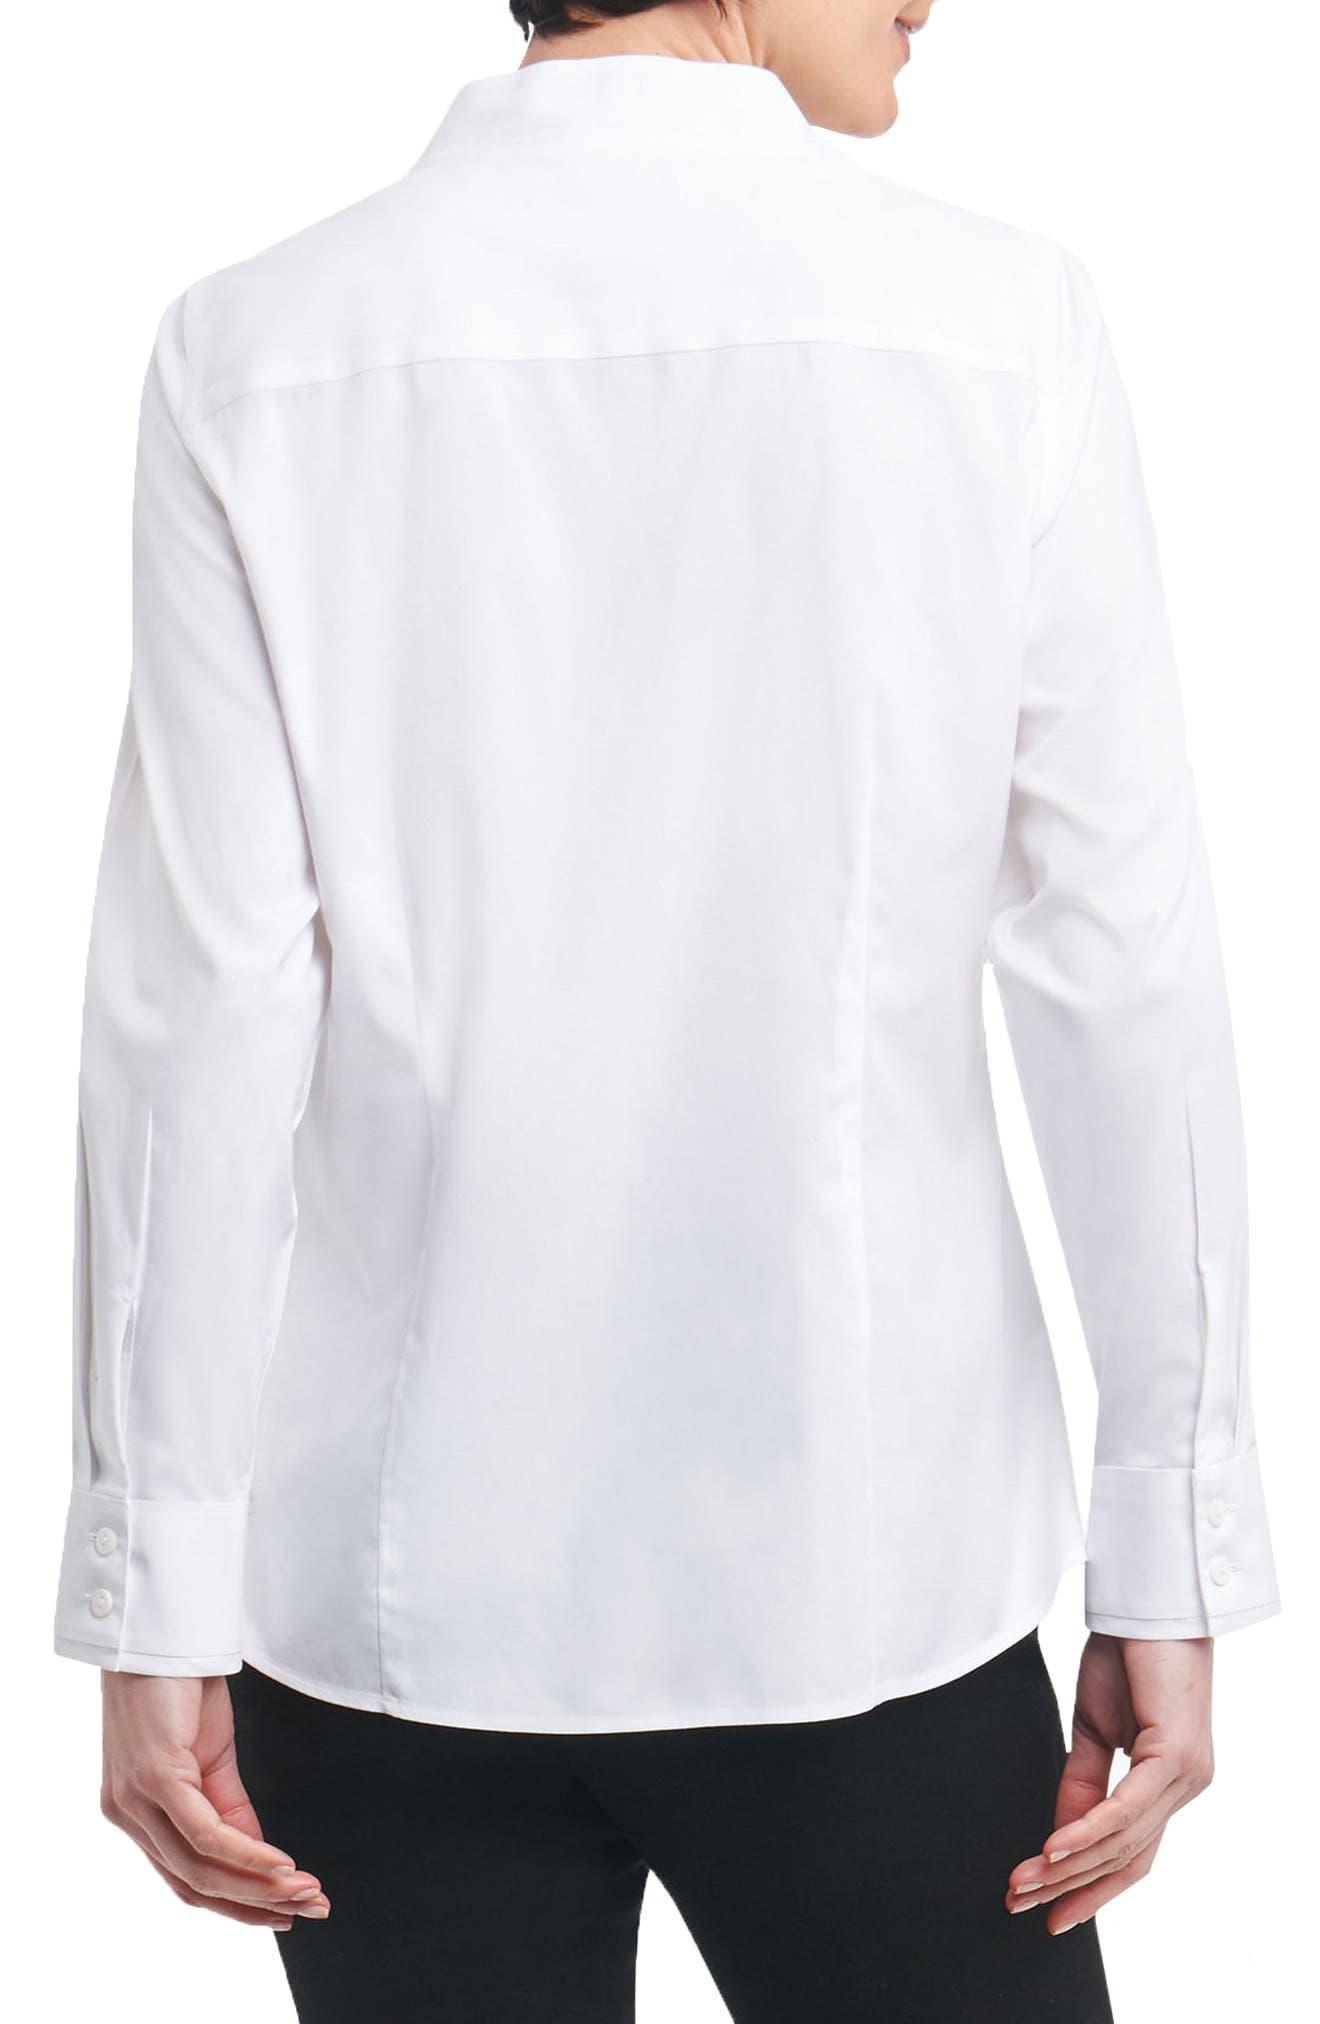 Jewel Stretch Cotton Shirt,                             Alternate thumbnail 2, color,                             100